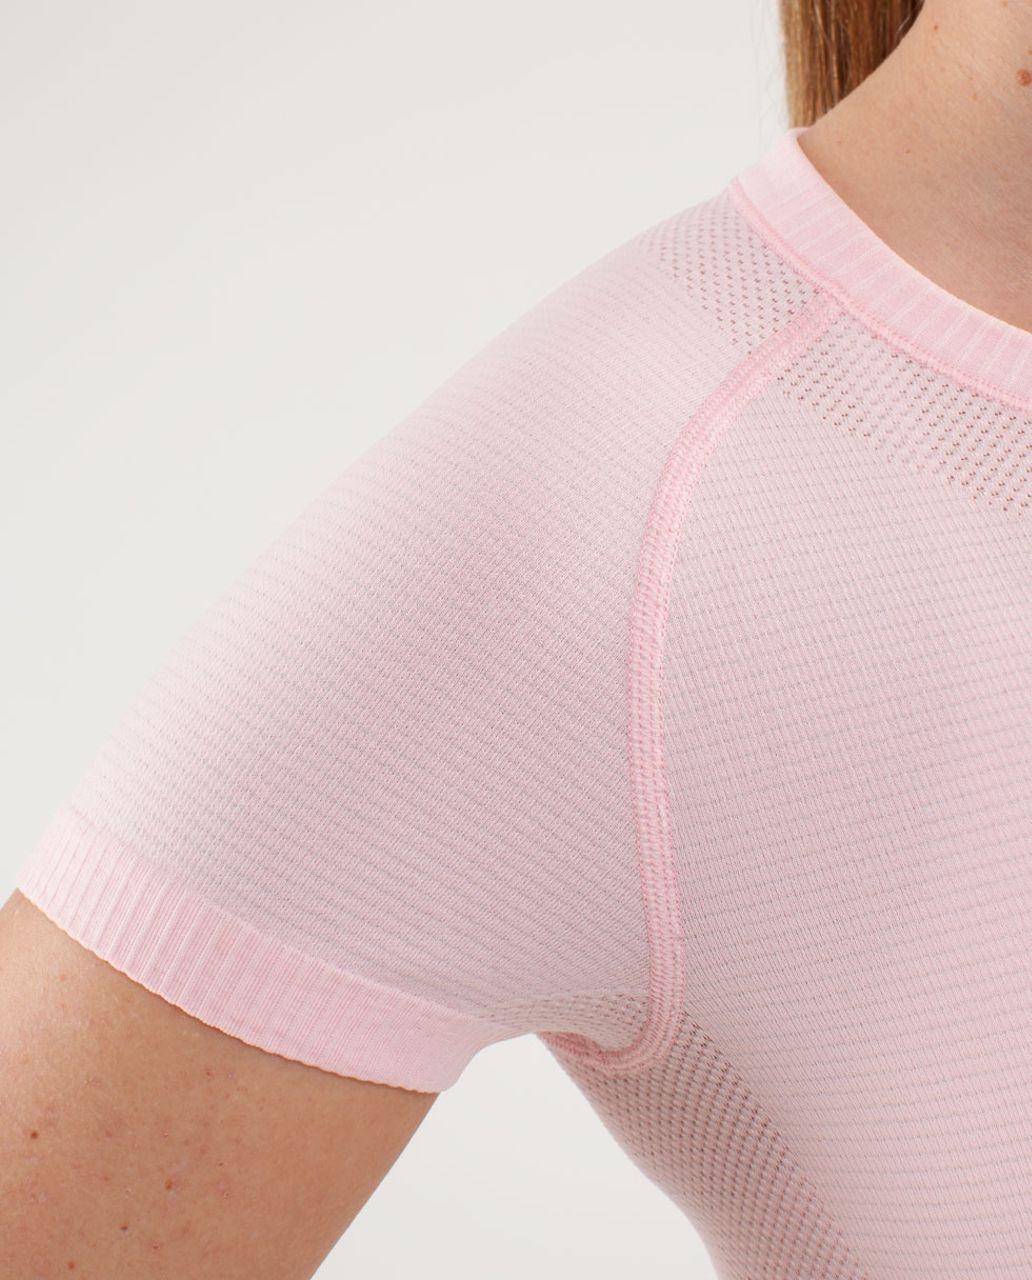 Lululemon Run:  Swiftly Tech Short Sleeve - Blush Quartz